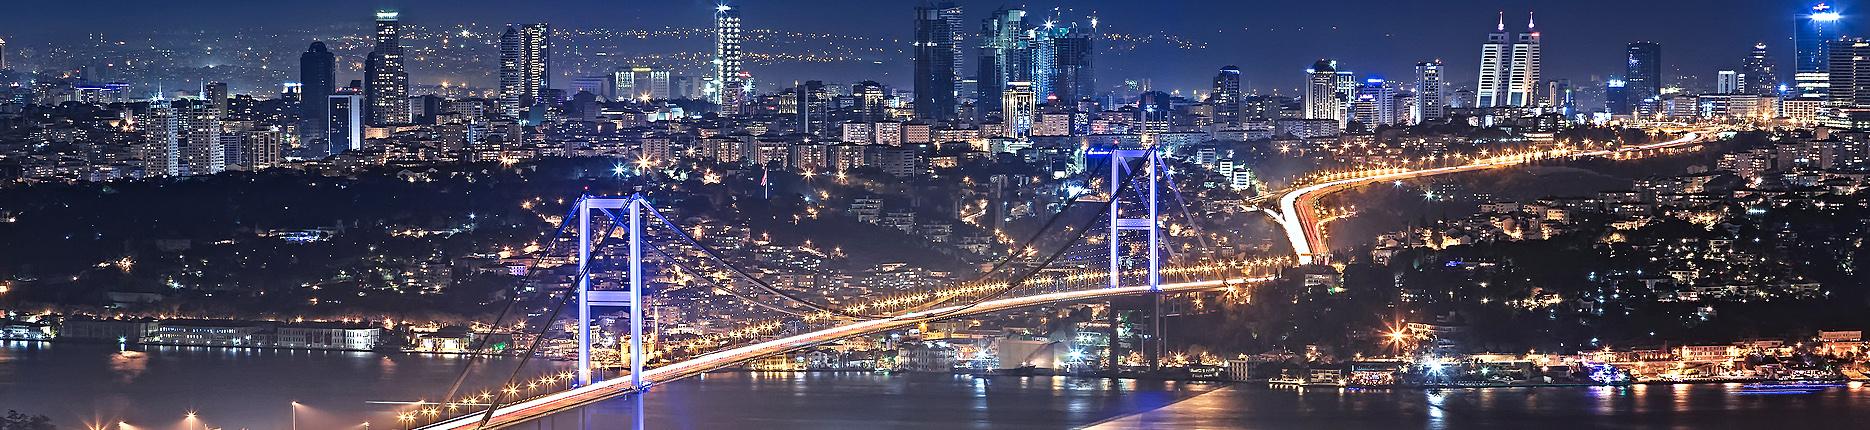 S-norton-web-banner-istanbul7